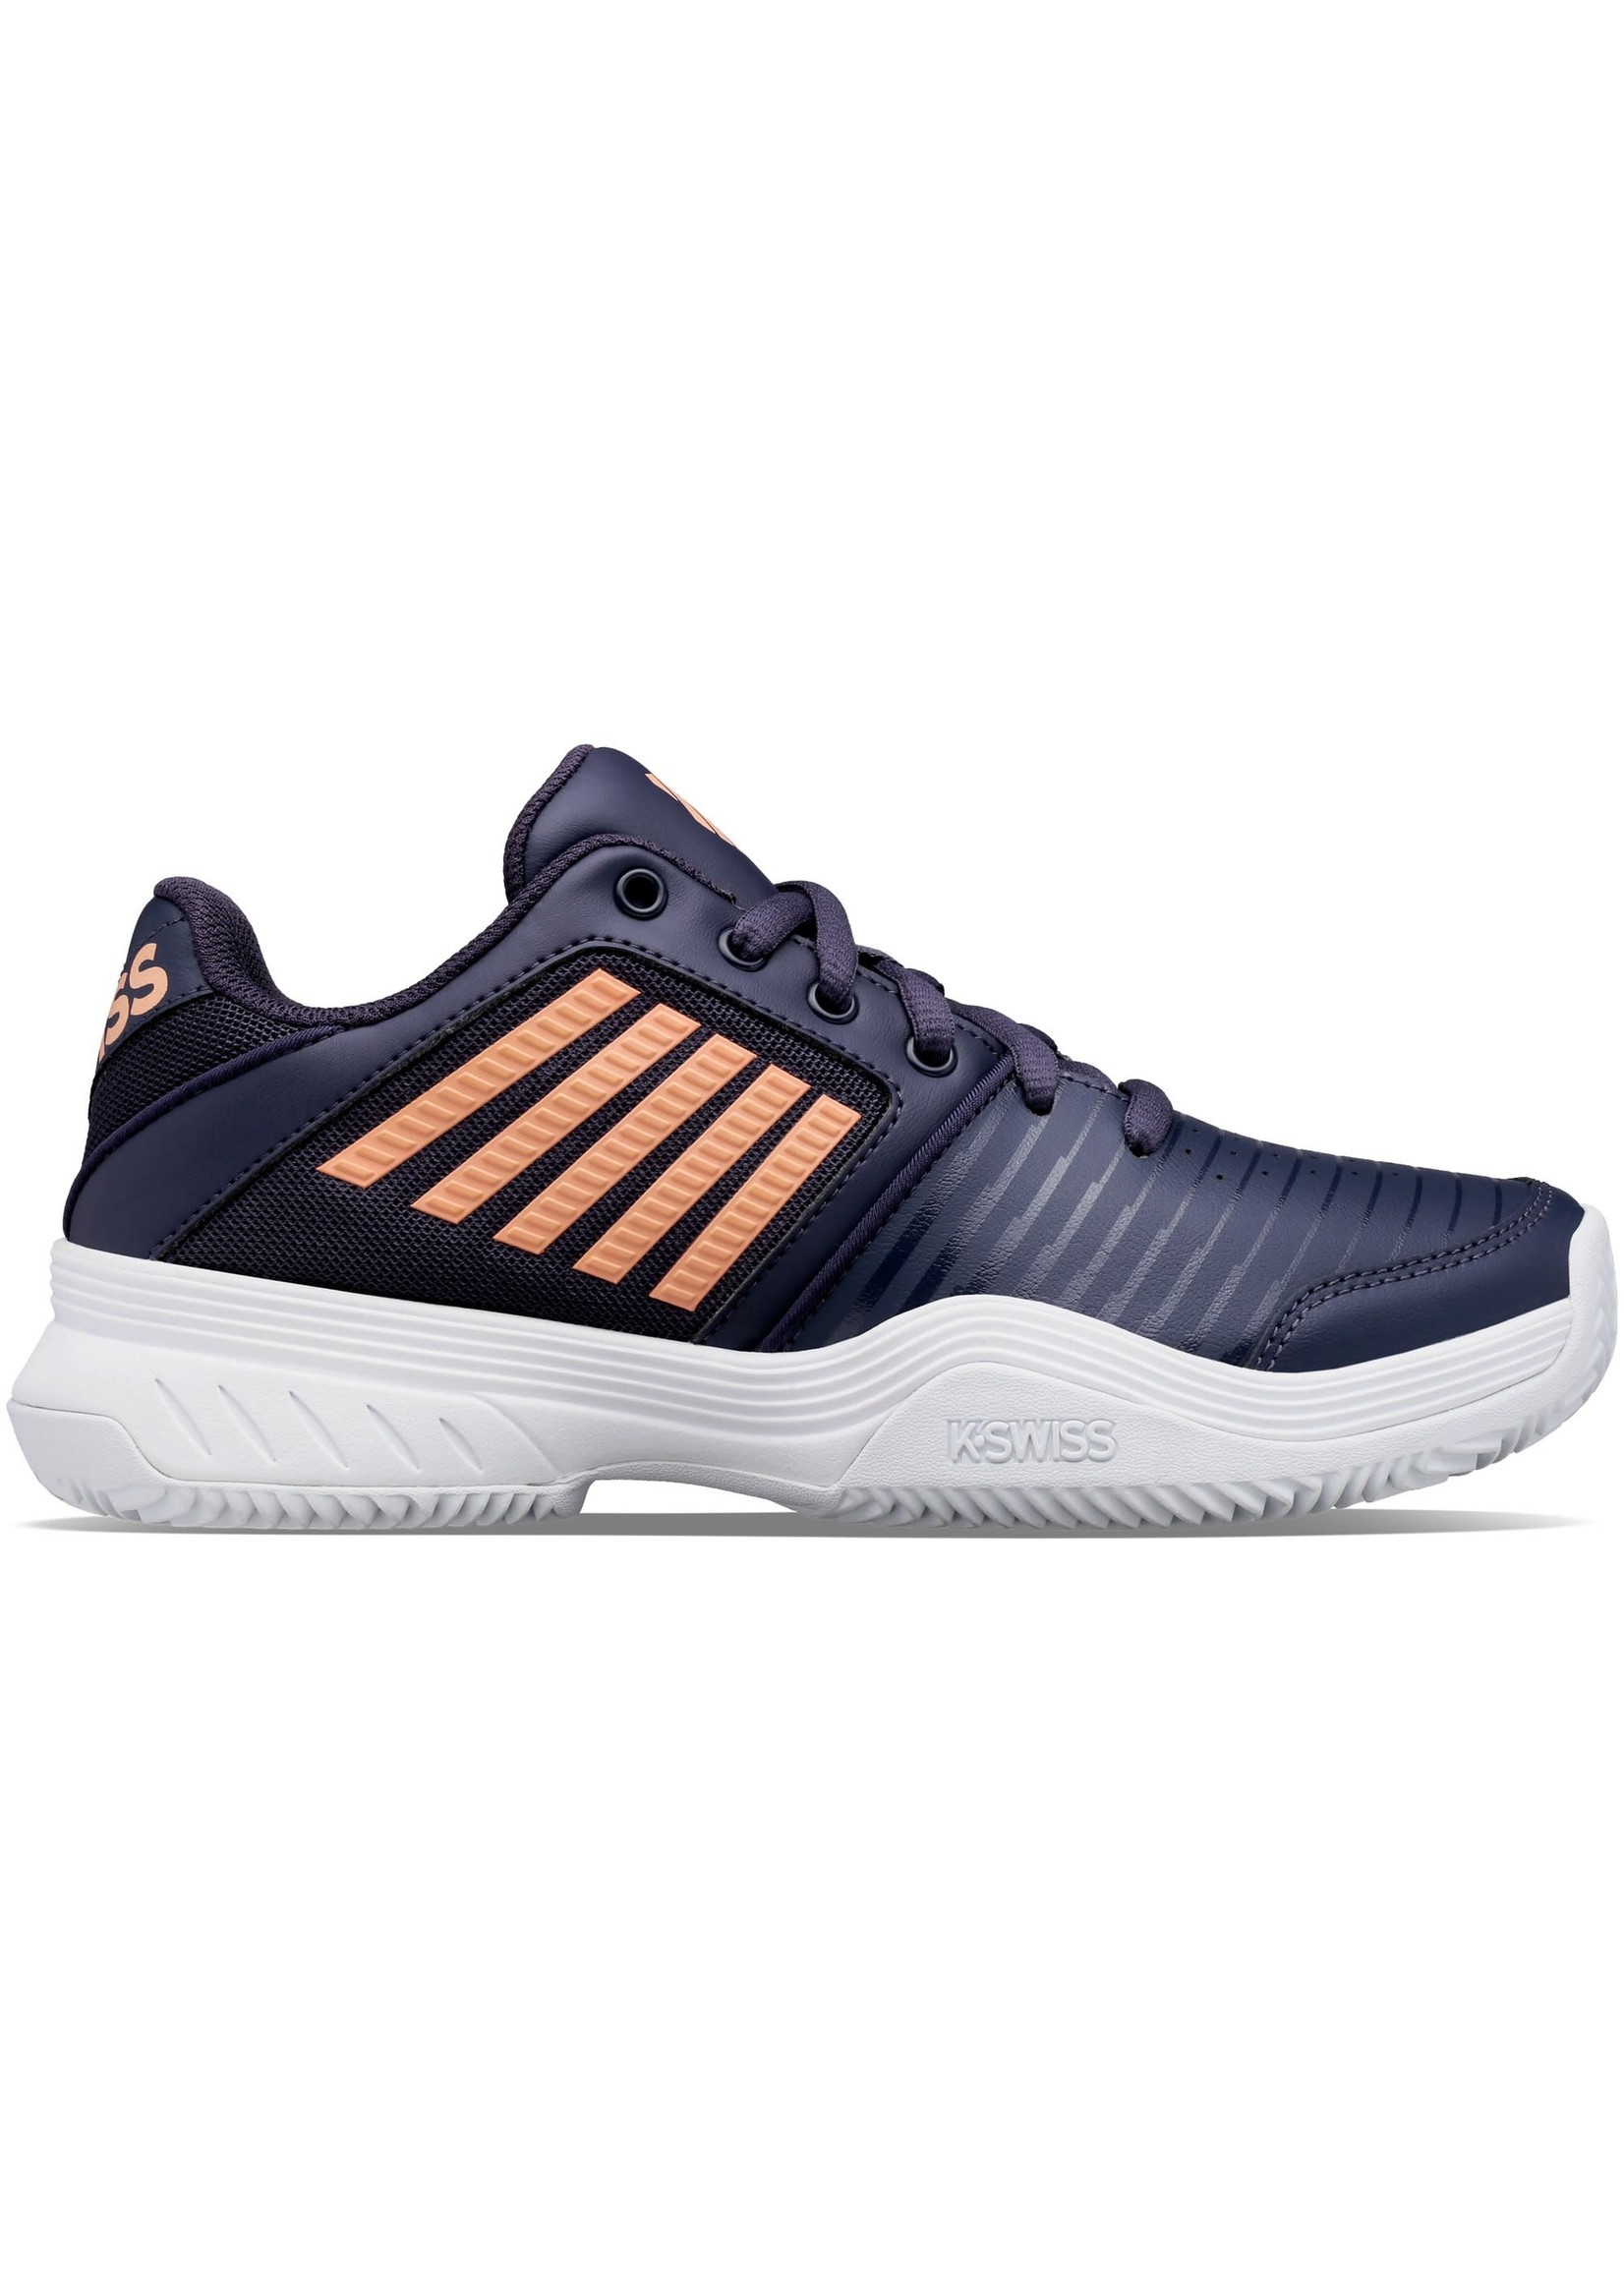 K Swiss K Swiss Court Express HB Ladies Tennis Shoe (2021) - Navy/Peach